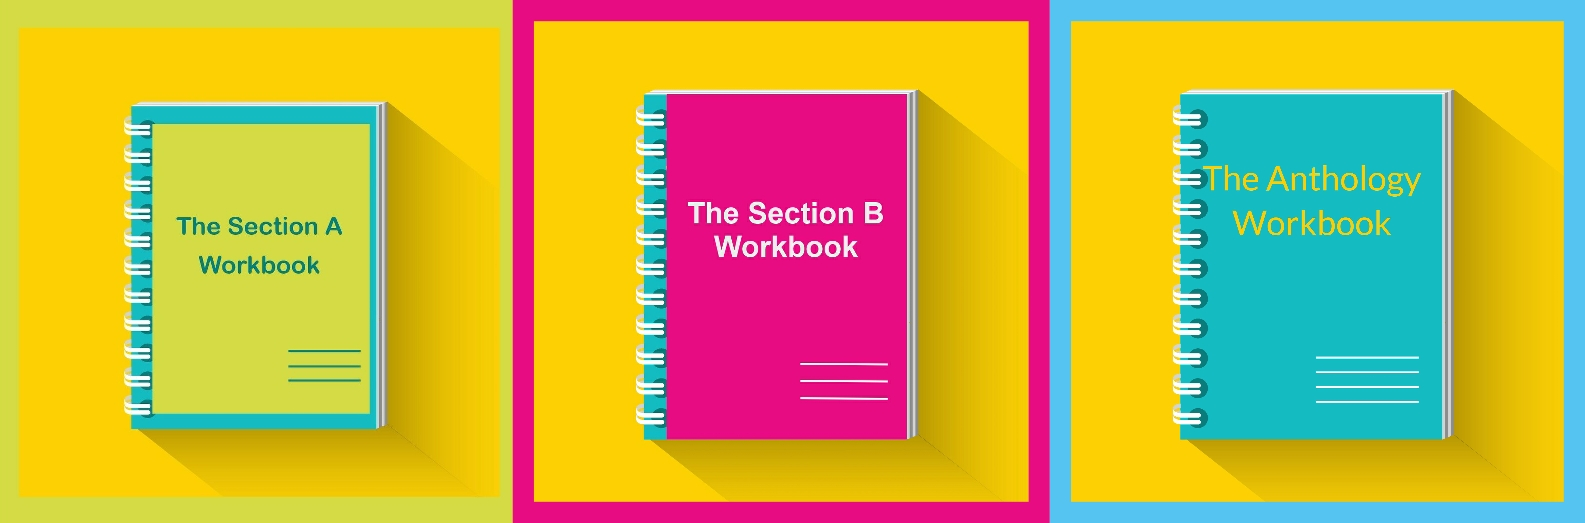 The 3 Written Paper Workbooks Bundle – Limited Offer